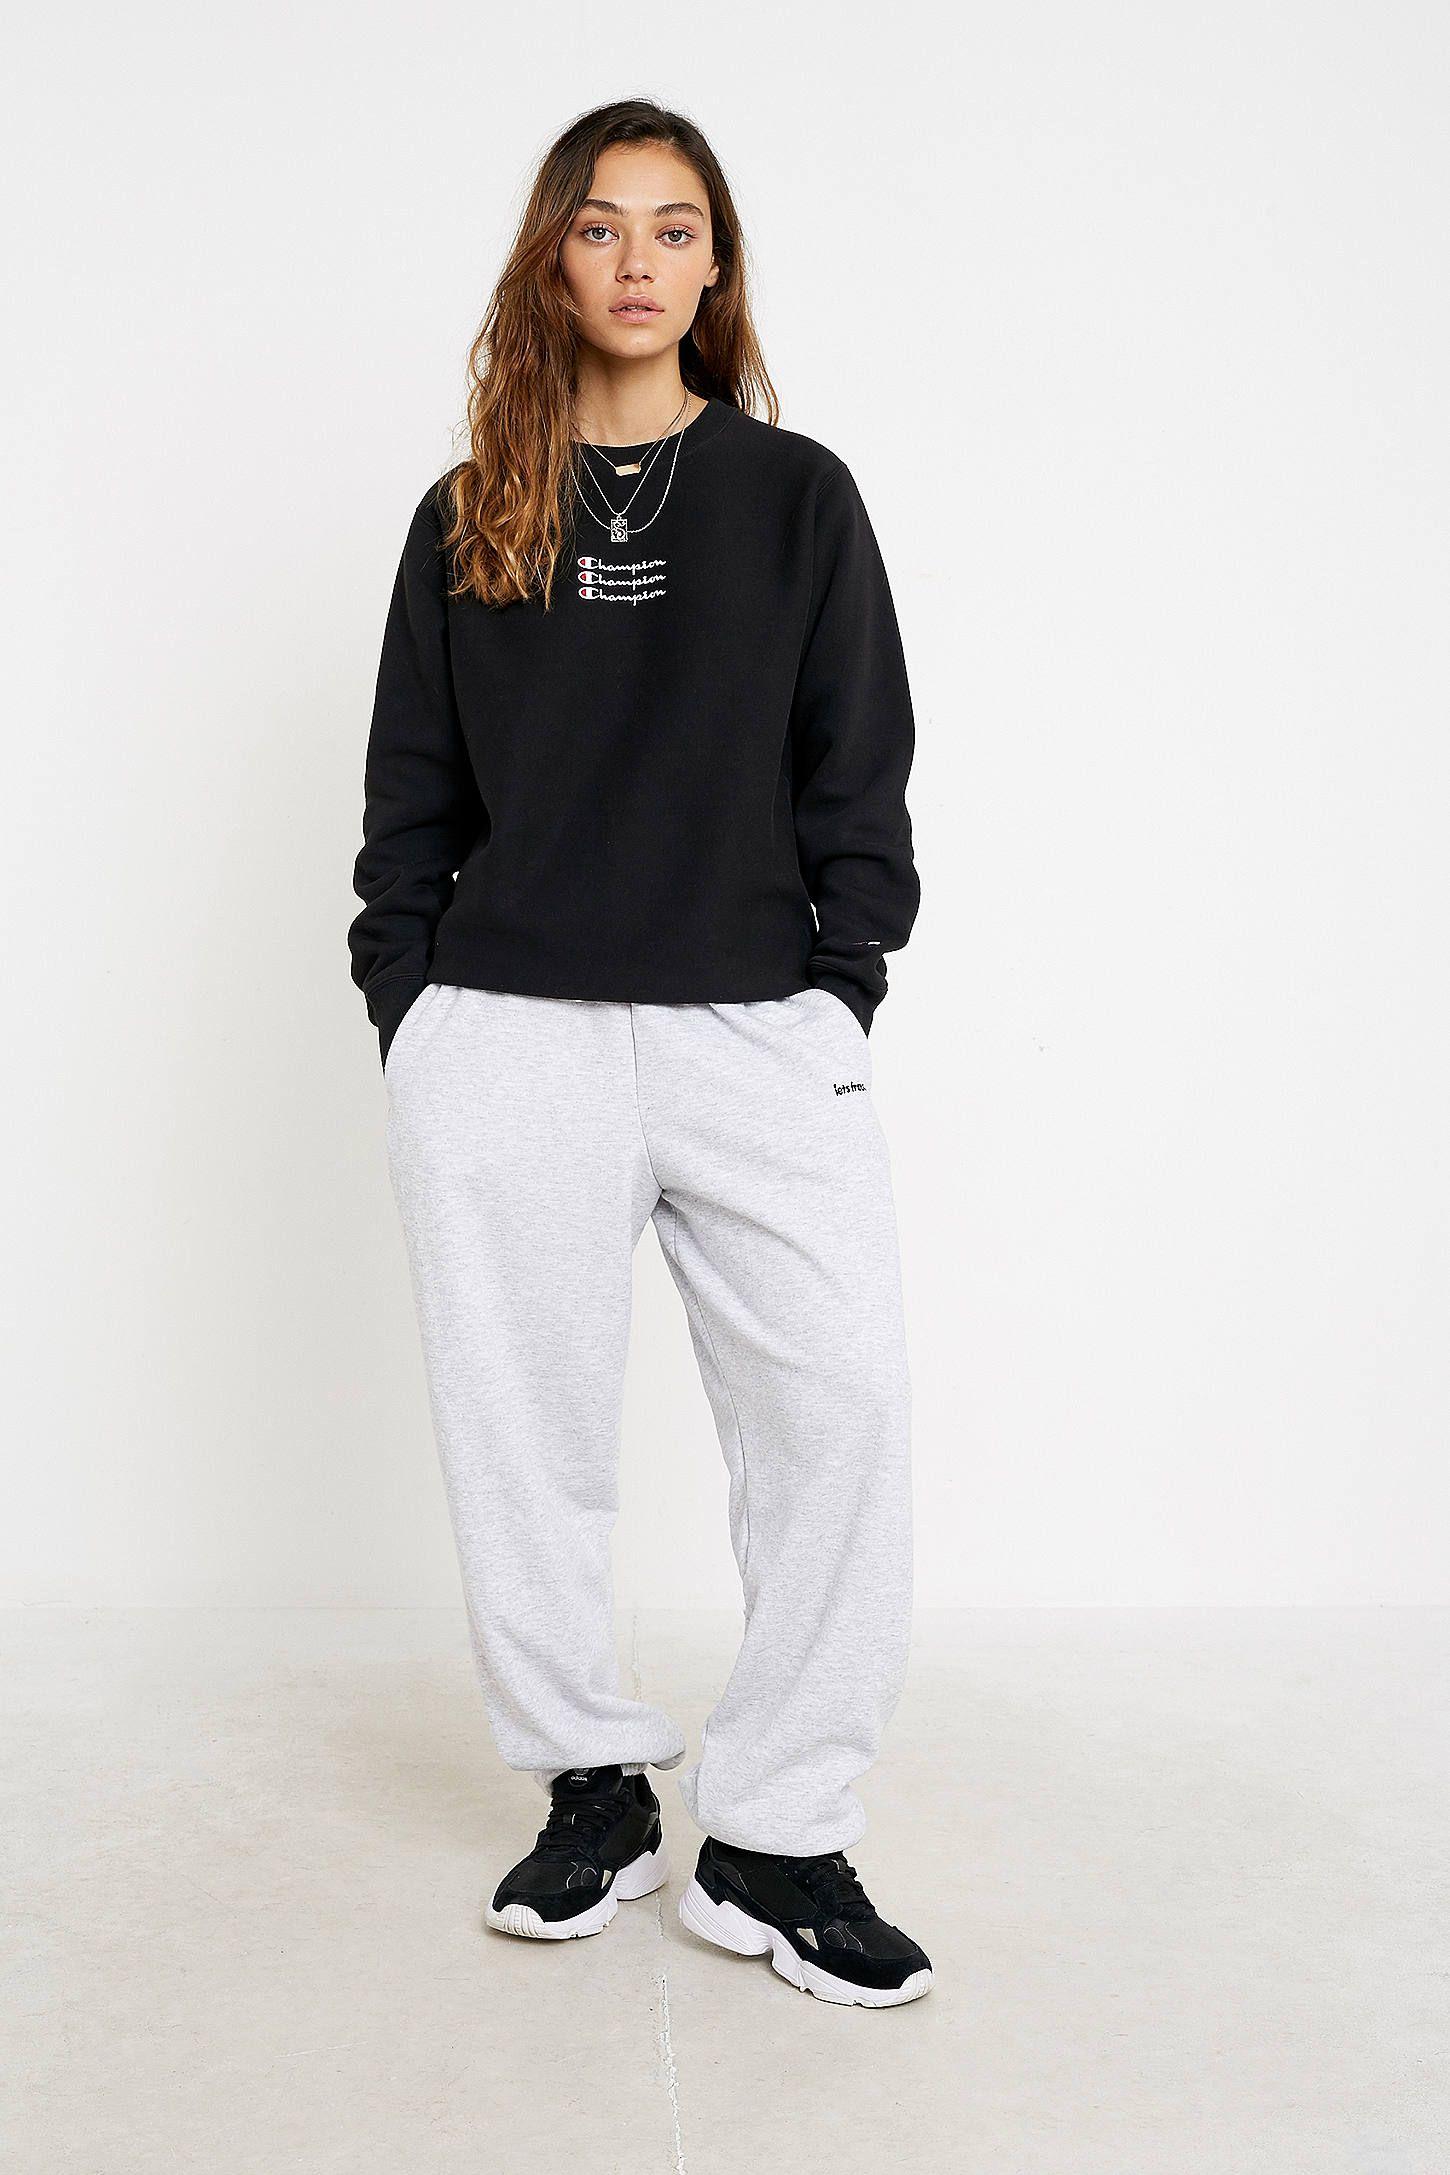 Champion Uo Exclusive Triple Script Logo Black Crew Neck Sweatshirt Urban Outfitters Uk Champion Clothing Clothes Clothes For Women [ 2175 x 1450 Pixel ]